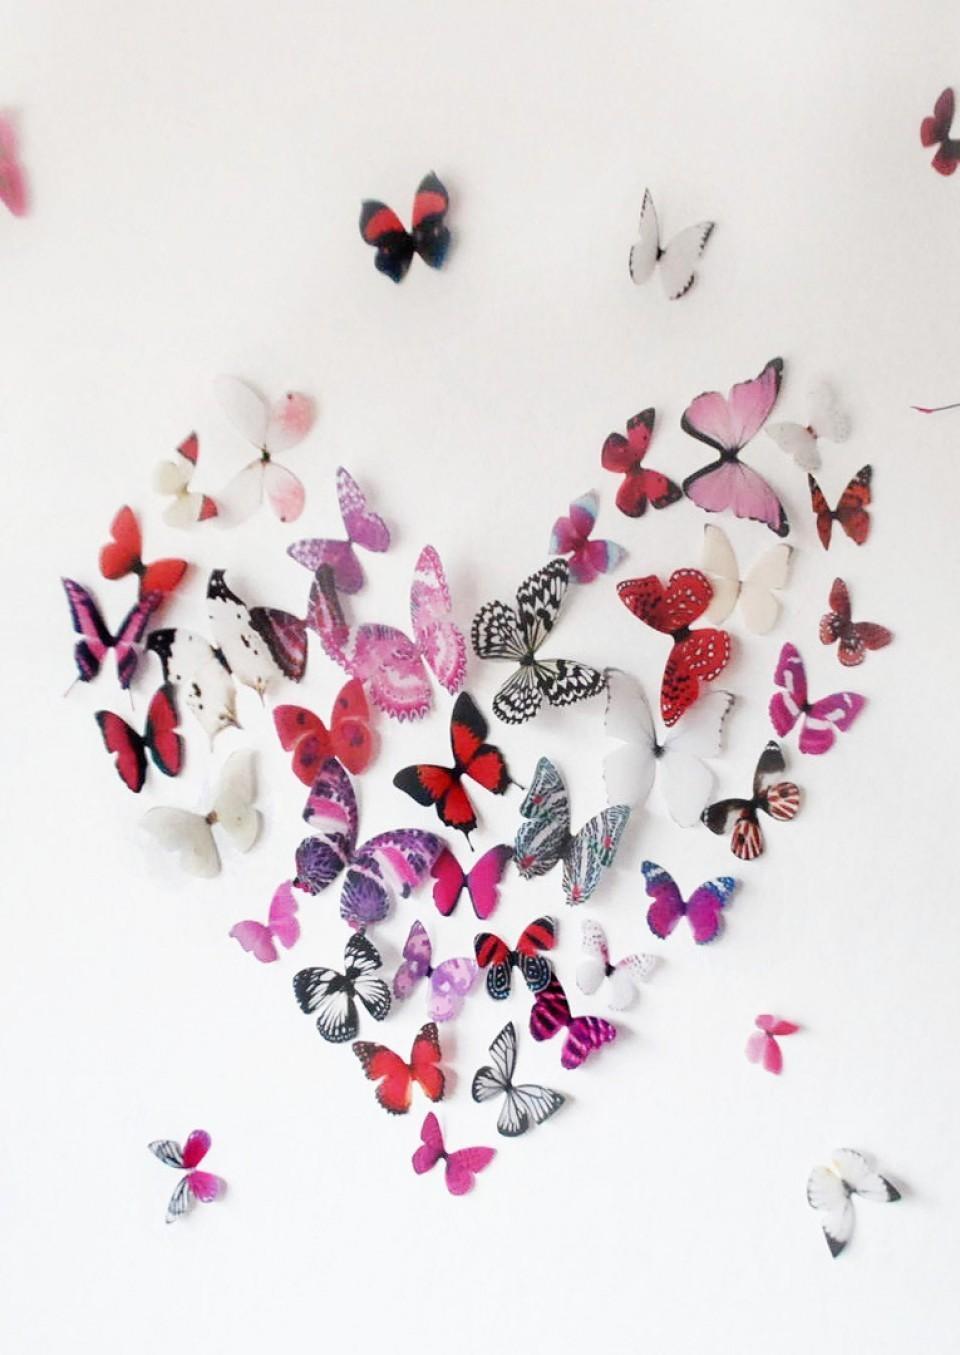 Декор стен бабочками своими руками: трафареты, материалы 81